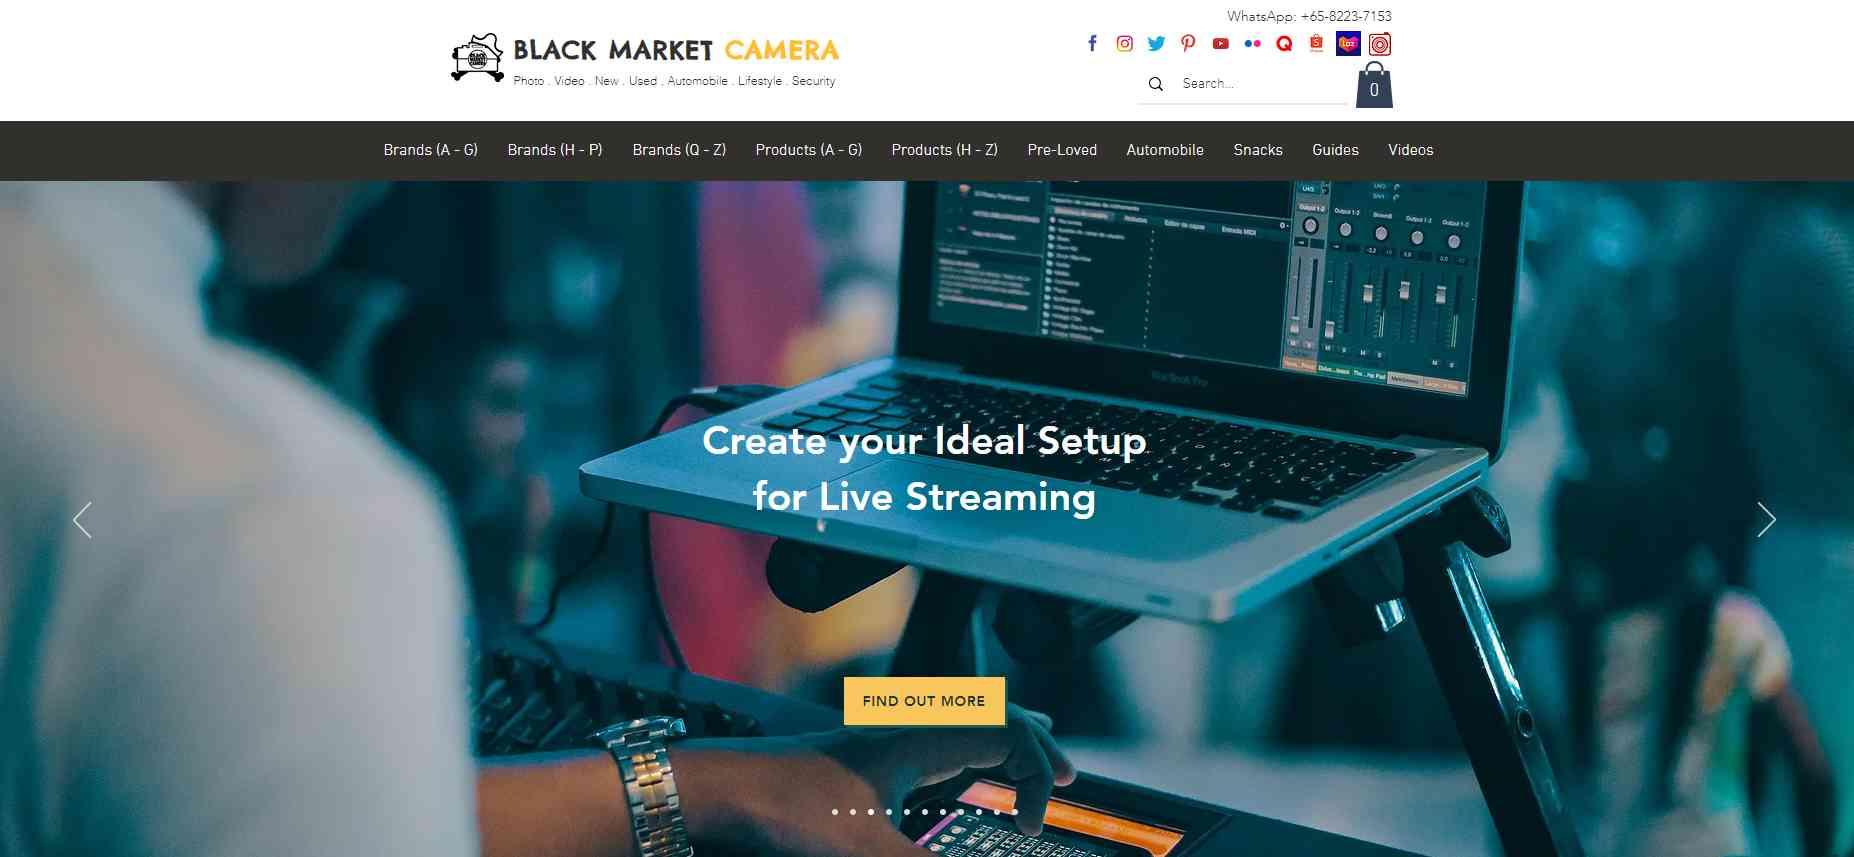 black market camera Top Camera Shops in Singapore